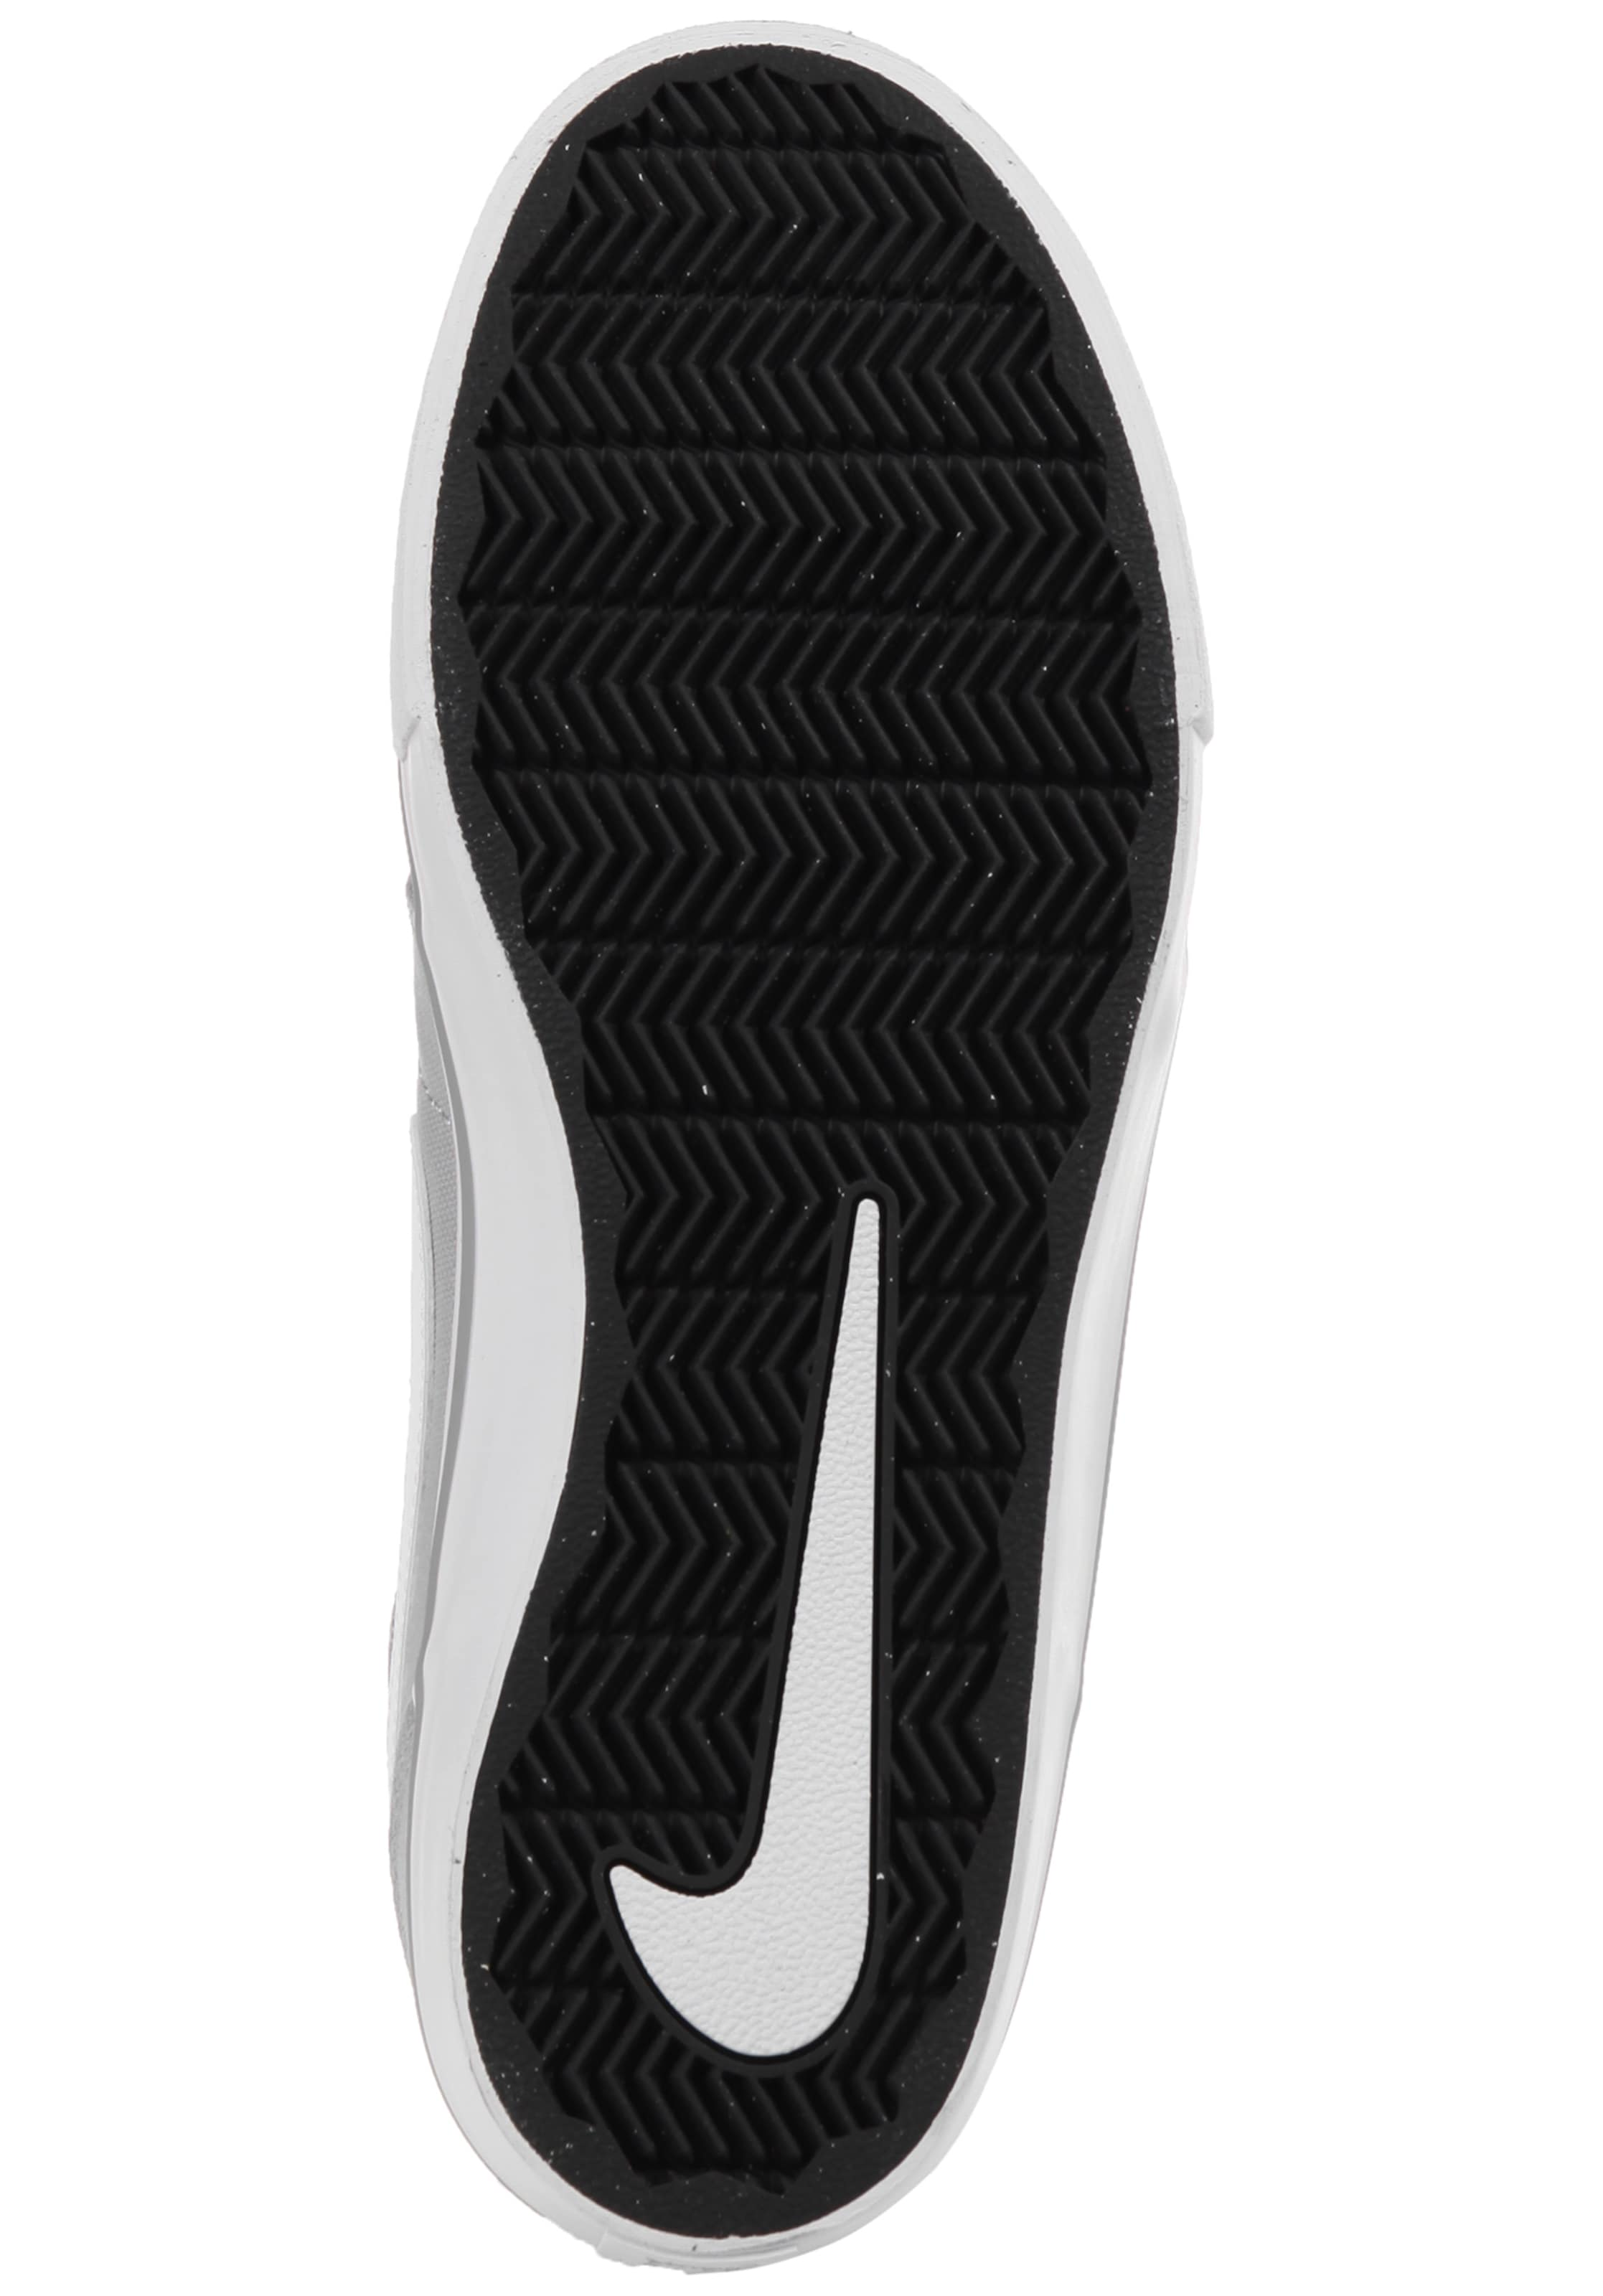 Nike SB Turnschuhe 'Portmore 'Portmore 'Portmore Ii Solar Textil Markenrabatt 946f19